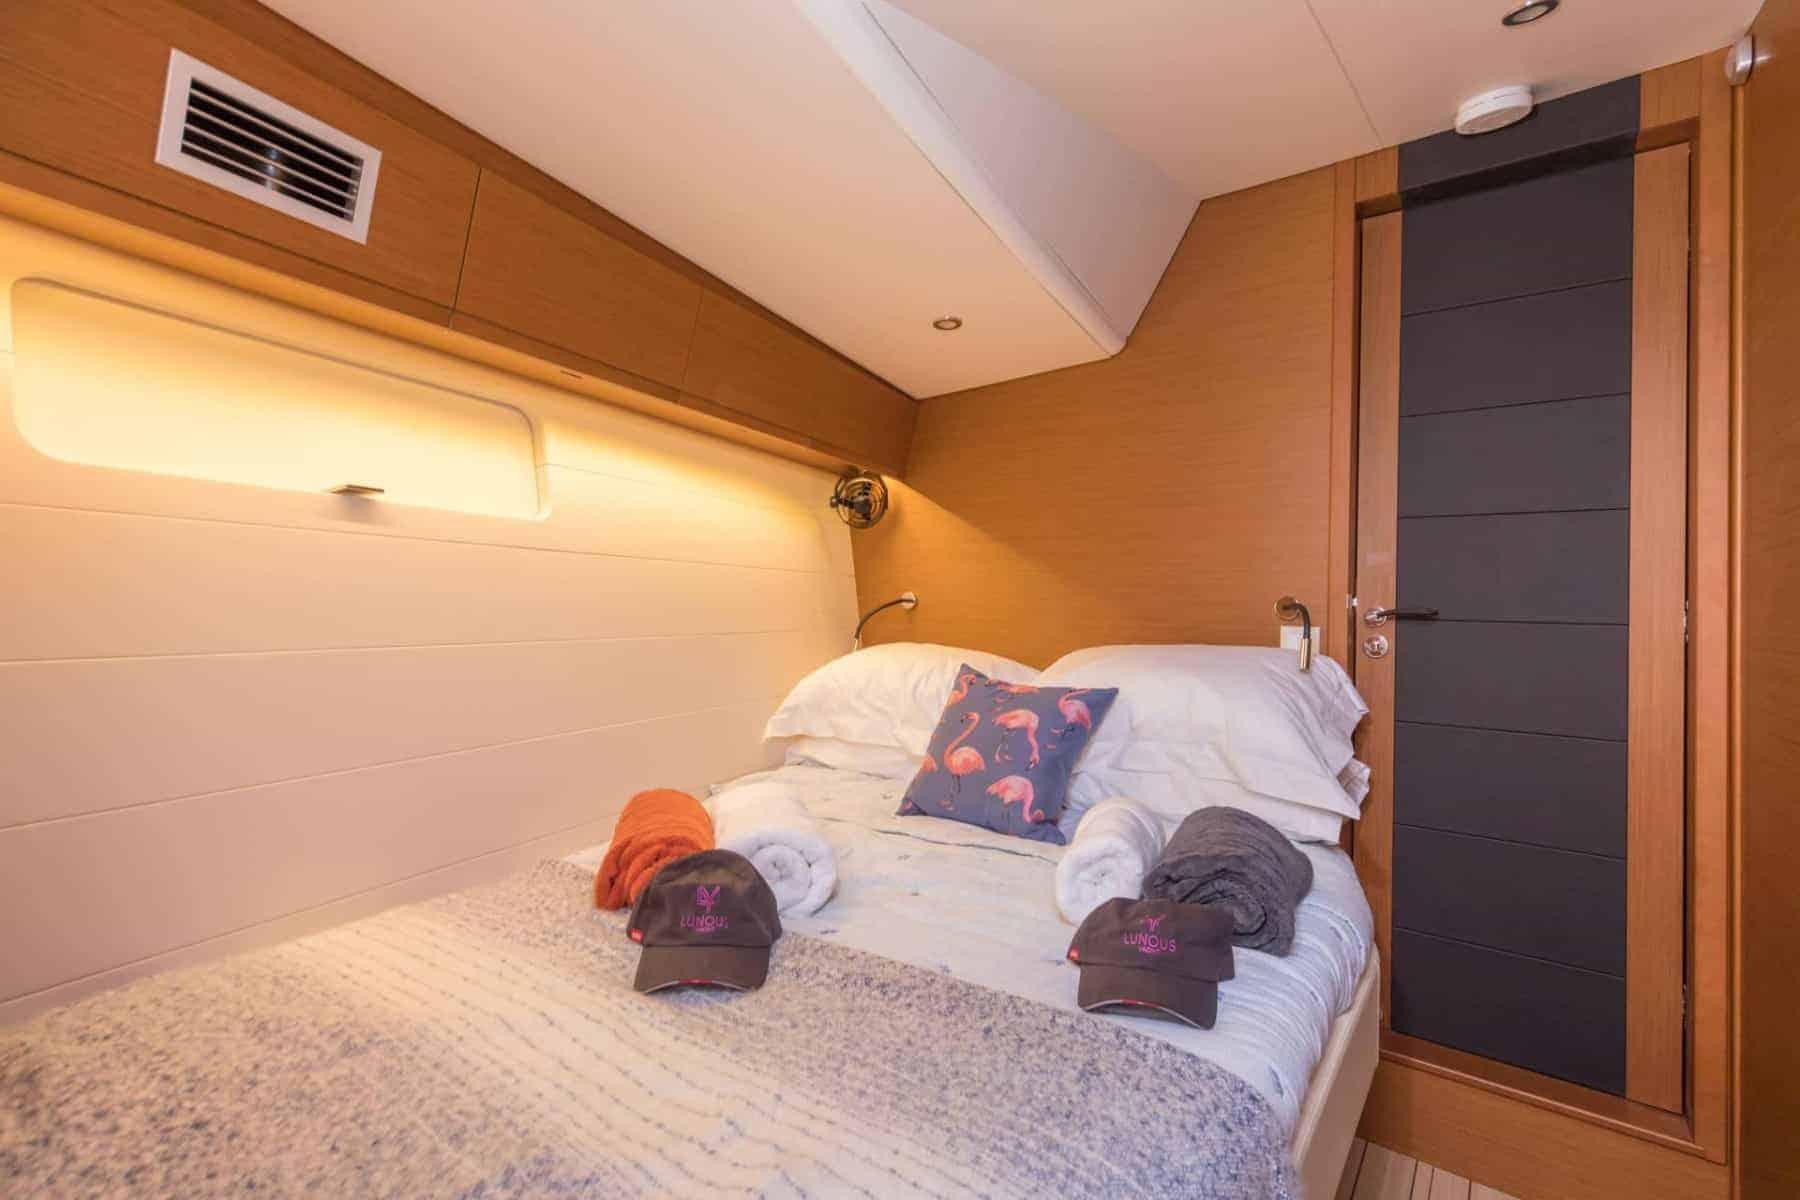 Jeanneau-64-interior-cabin-2-charter-ownership-yacht